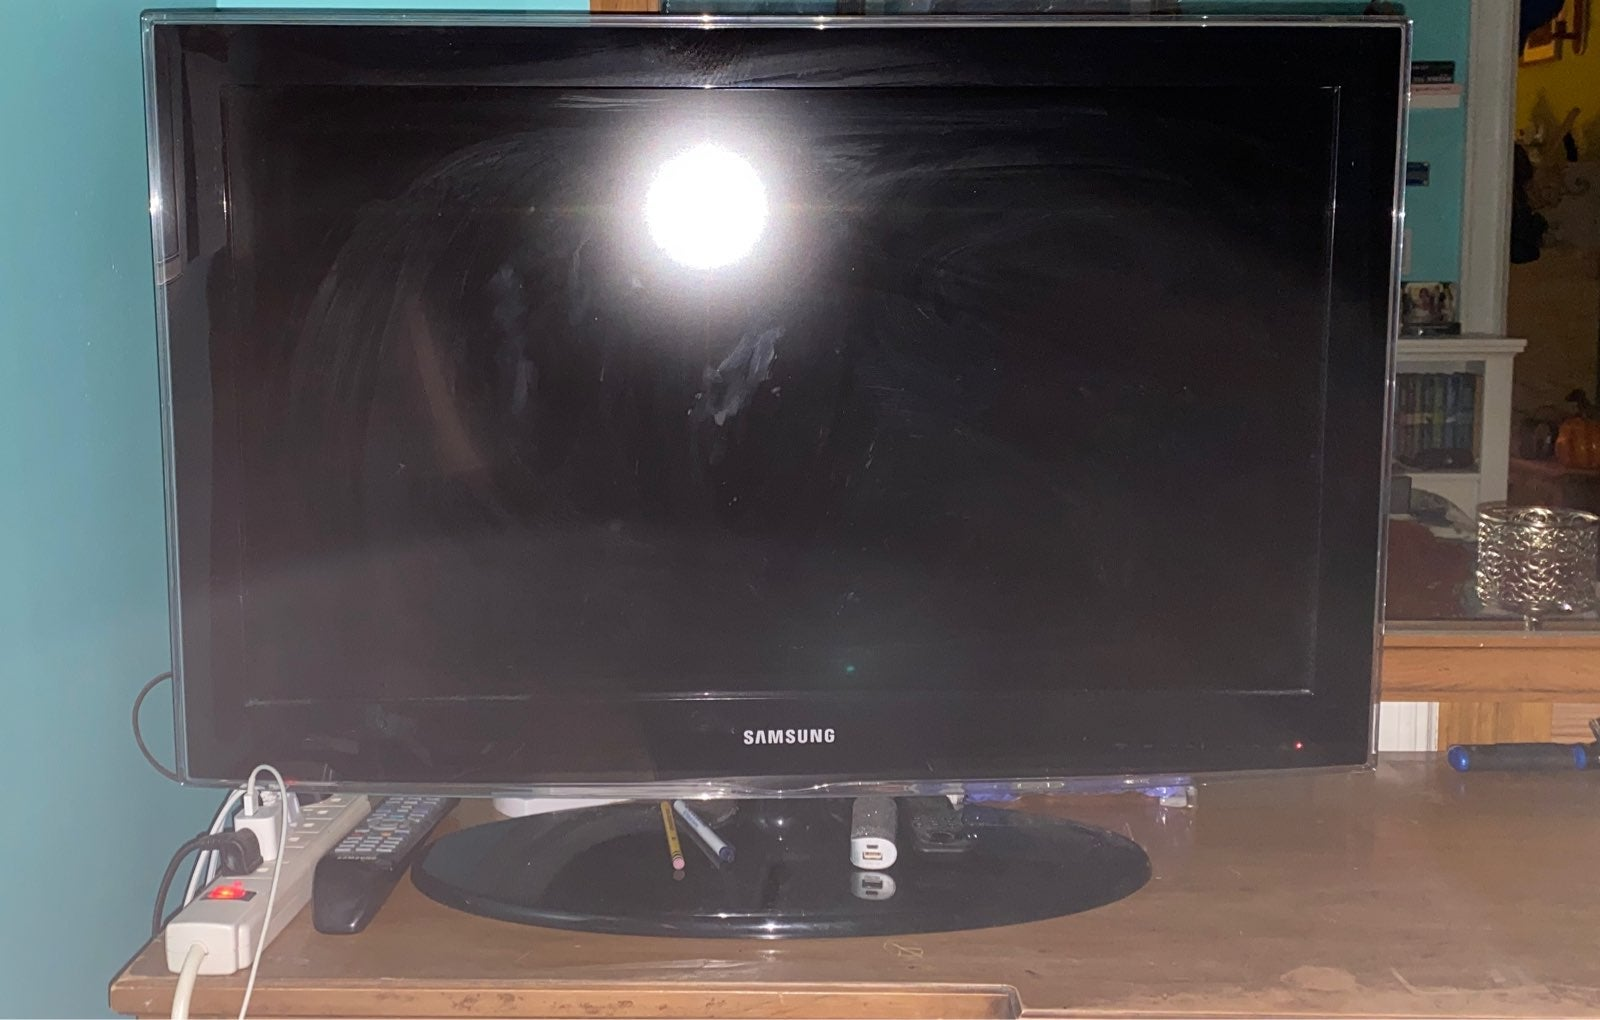 Samsung 32' Flat screen TV